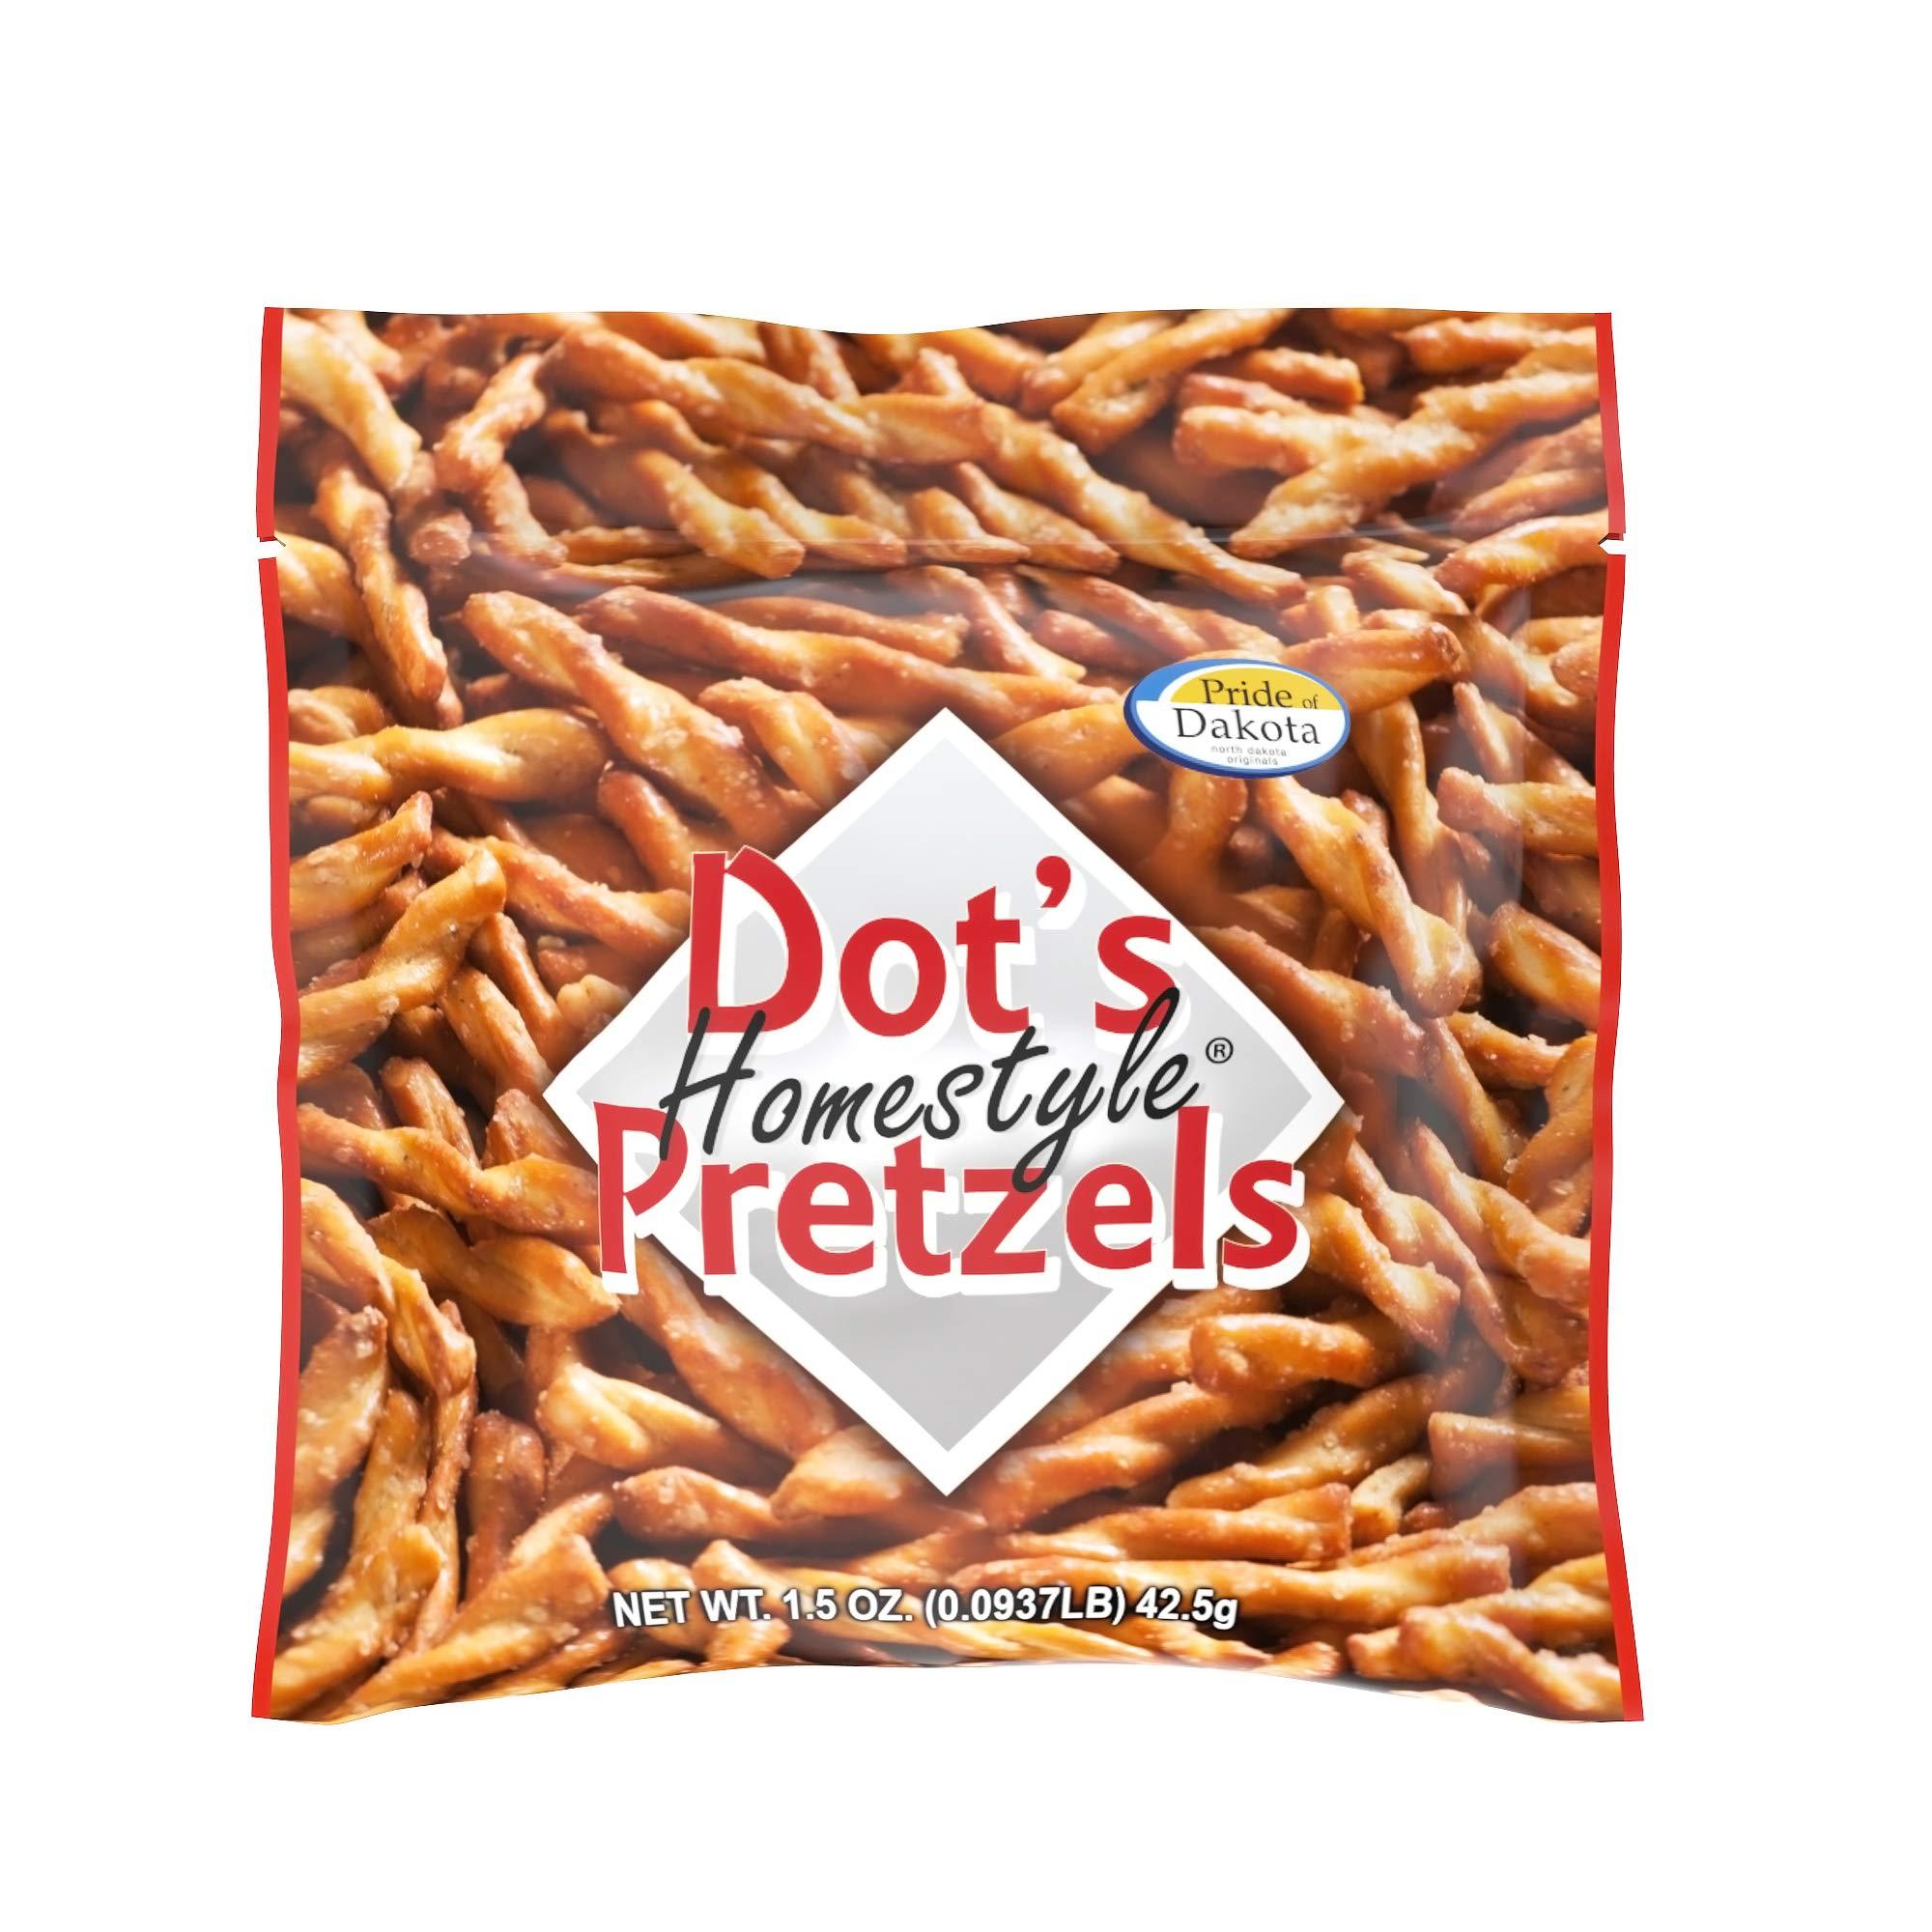 Dot's Homestyle Pretzels 1.5 oz. Bags (20 Pack) Lunchbox Sized Seasoned Pretzel Snack Sticks by Dot's Homestyle Pretzels